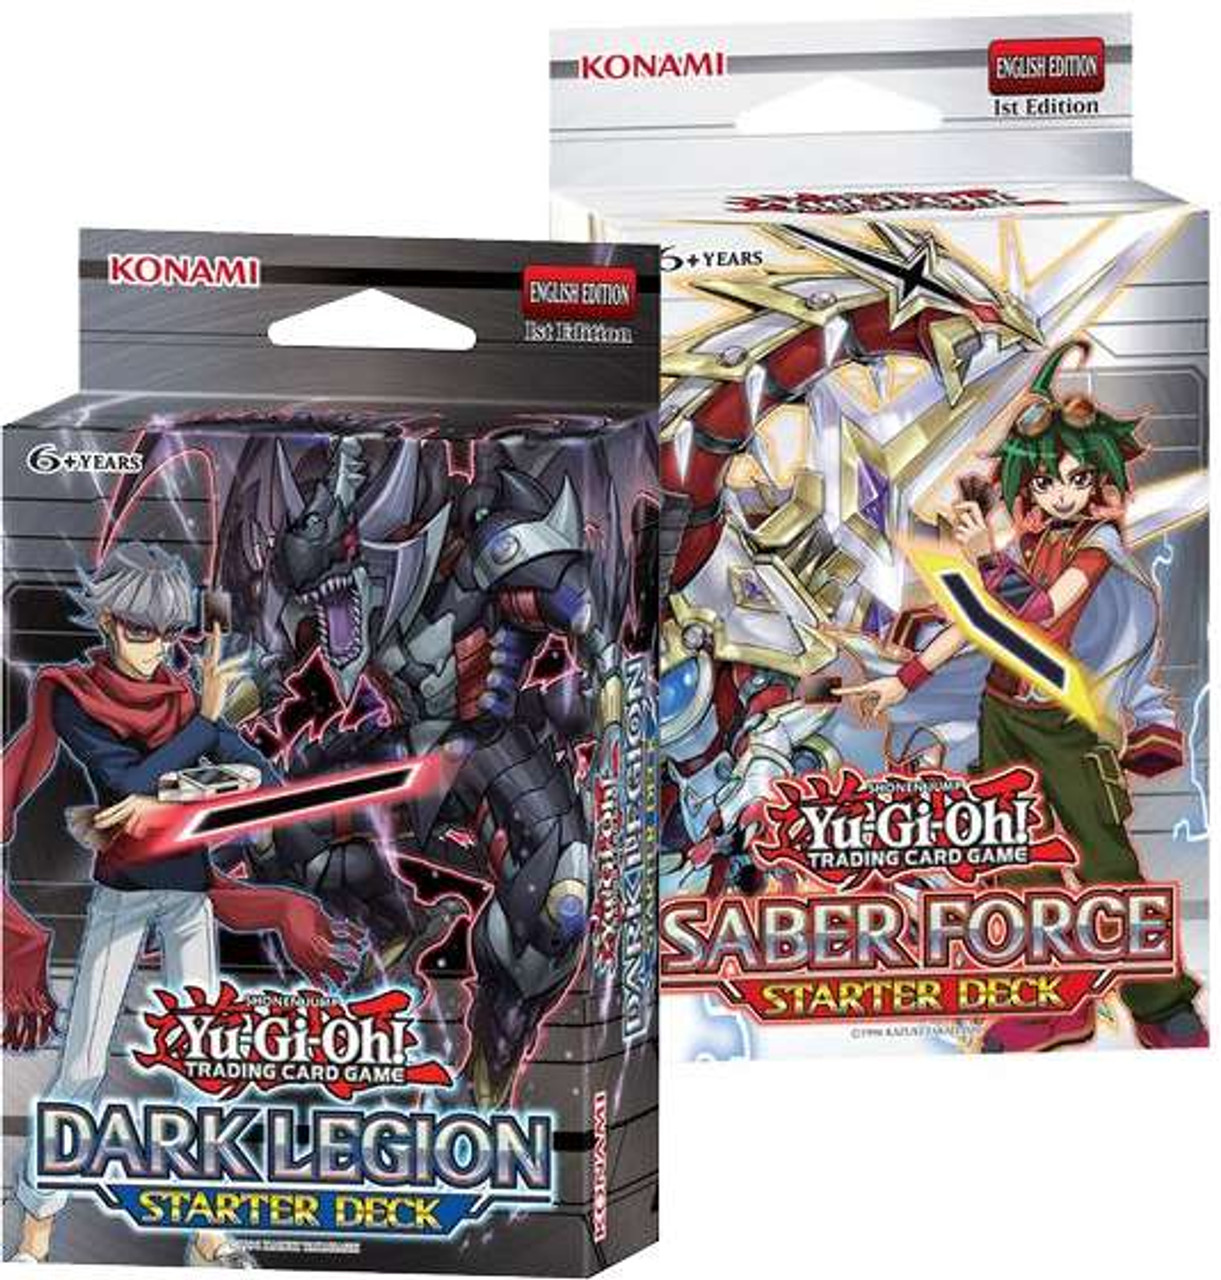 Yugioh set of both saber force dark legion starter decks sealed deck yugioh set of both saber force dark legion starter decks sealed deck konami toywiz aloadofball Image collections